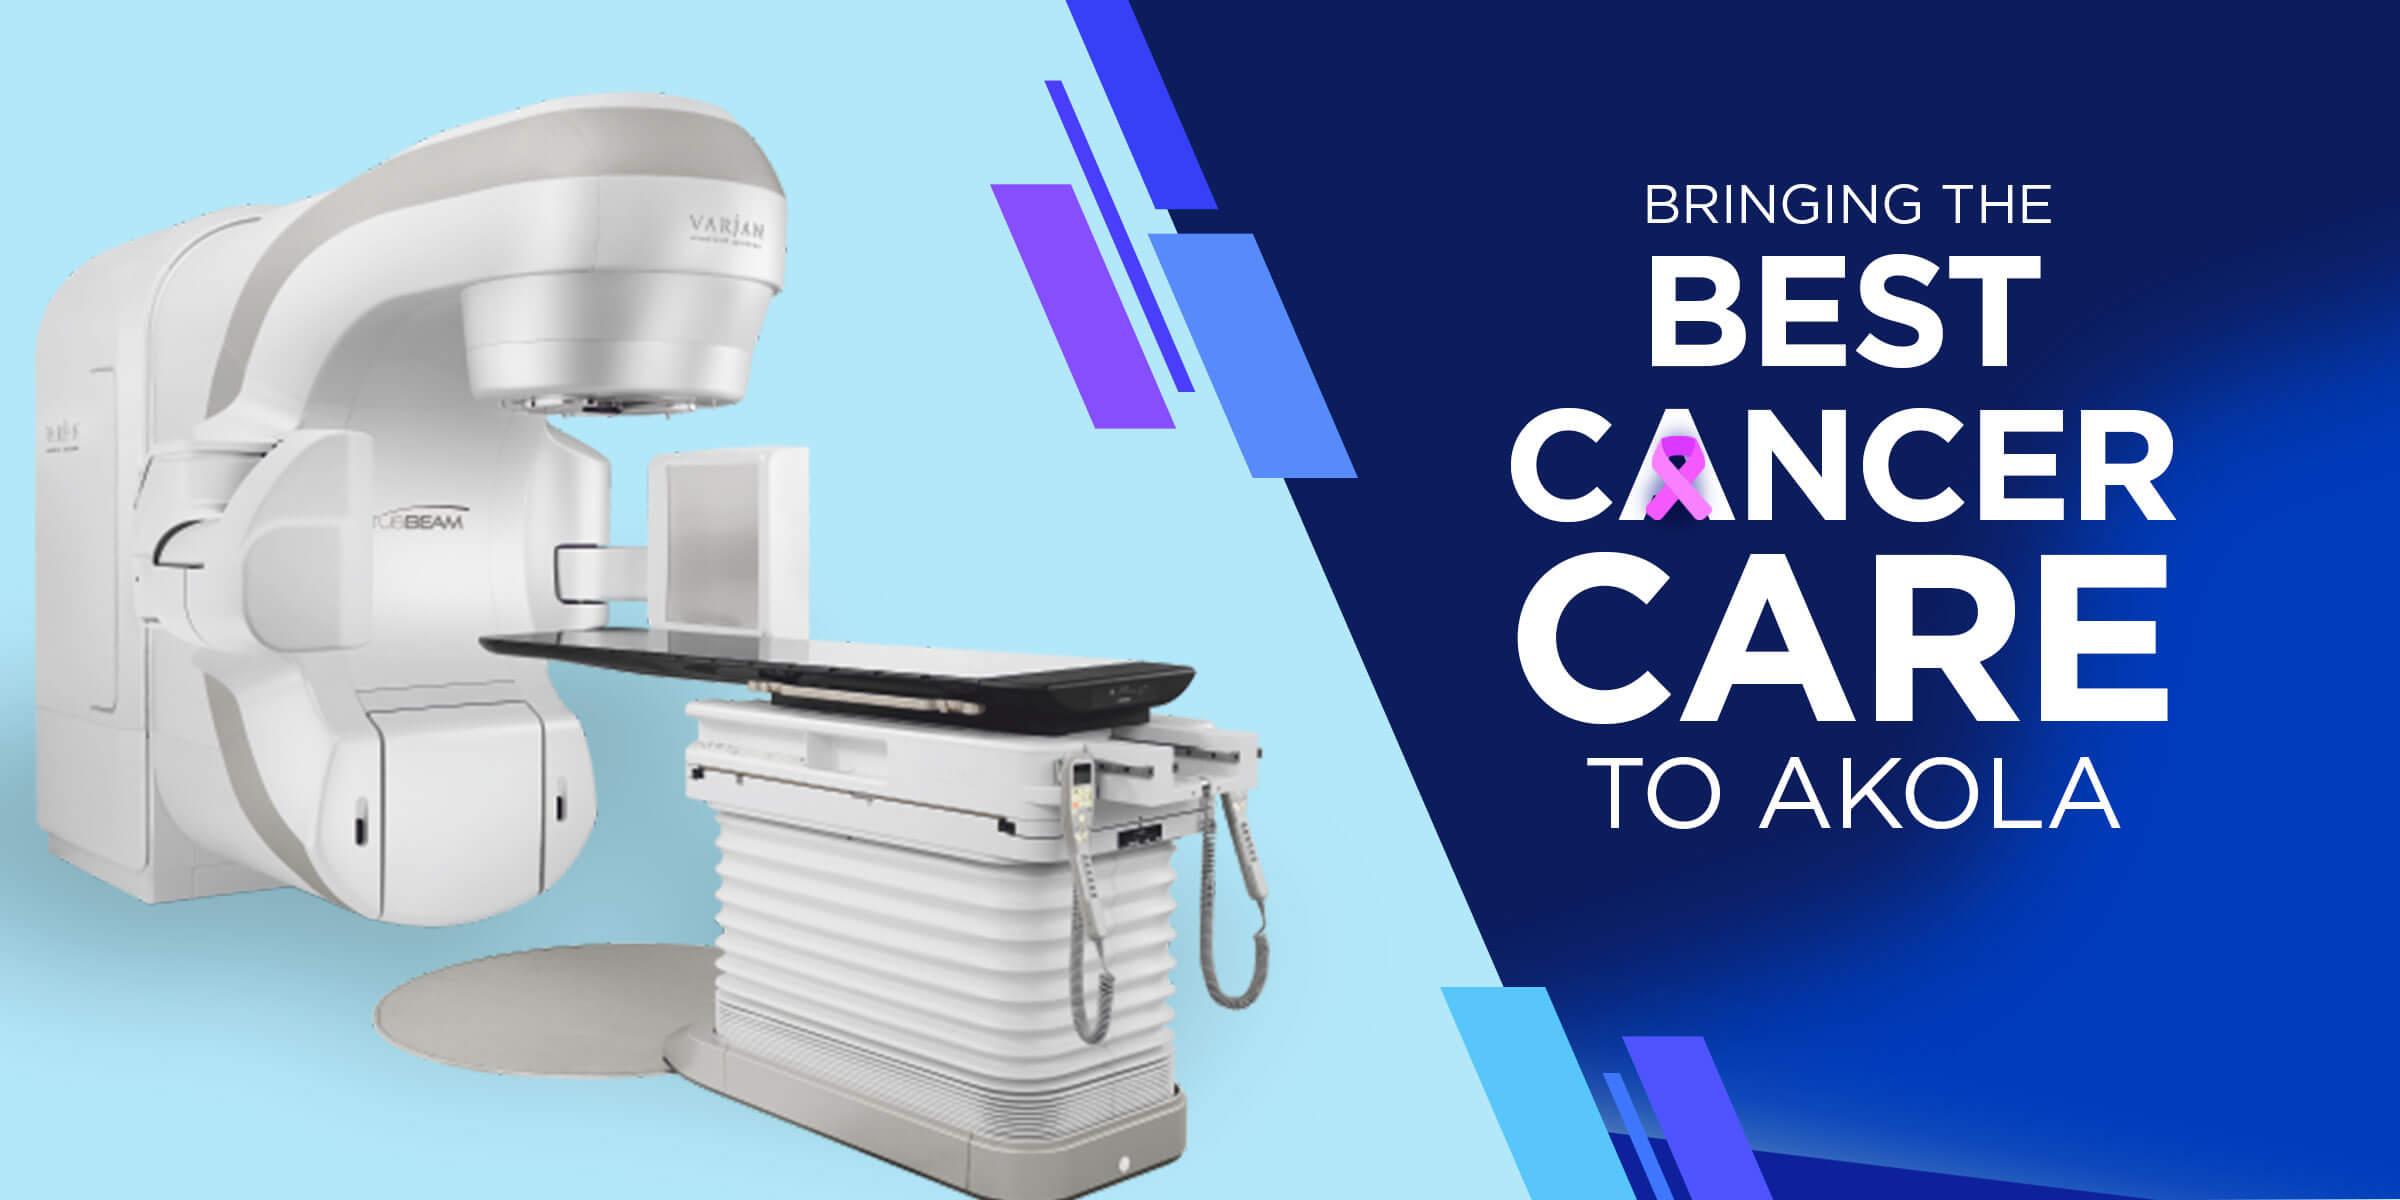 Best Cancer Care - Akola